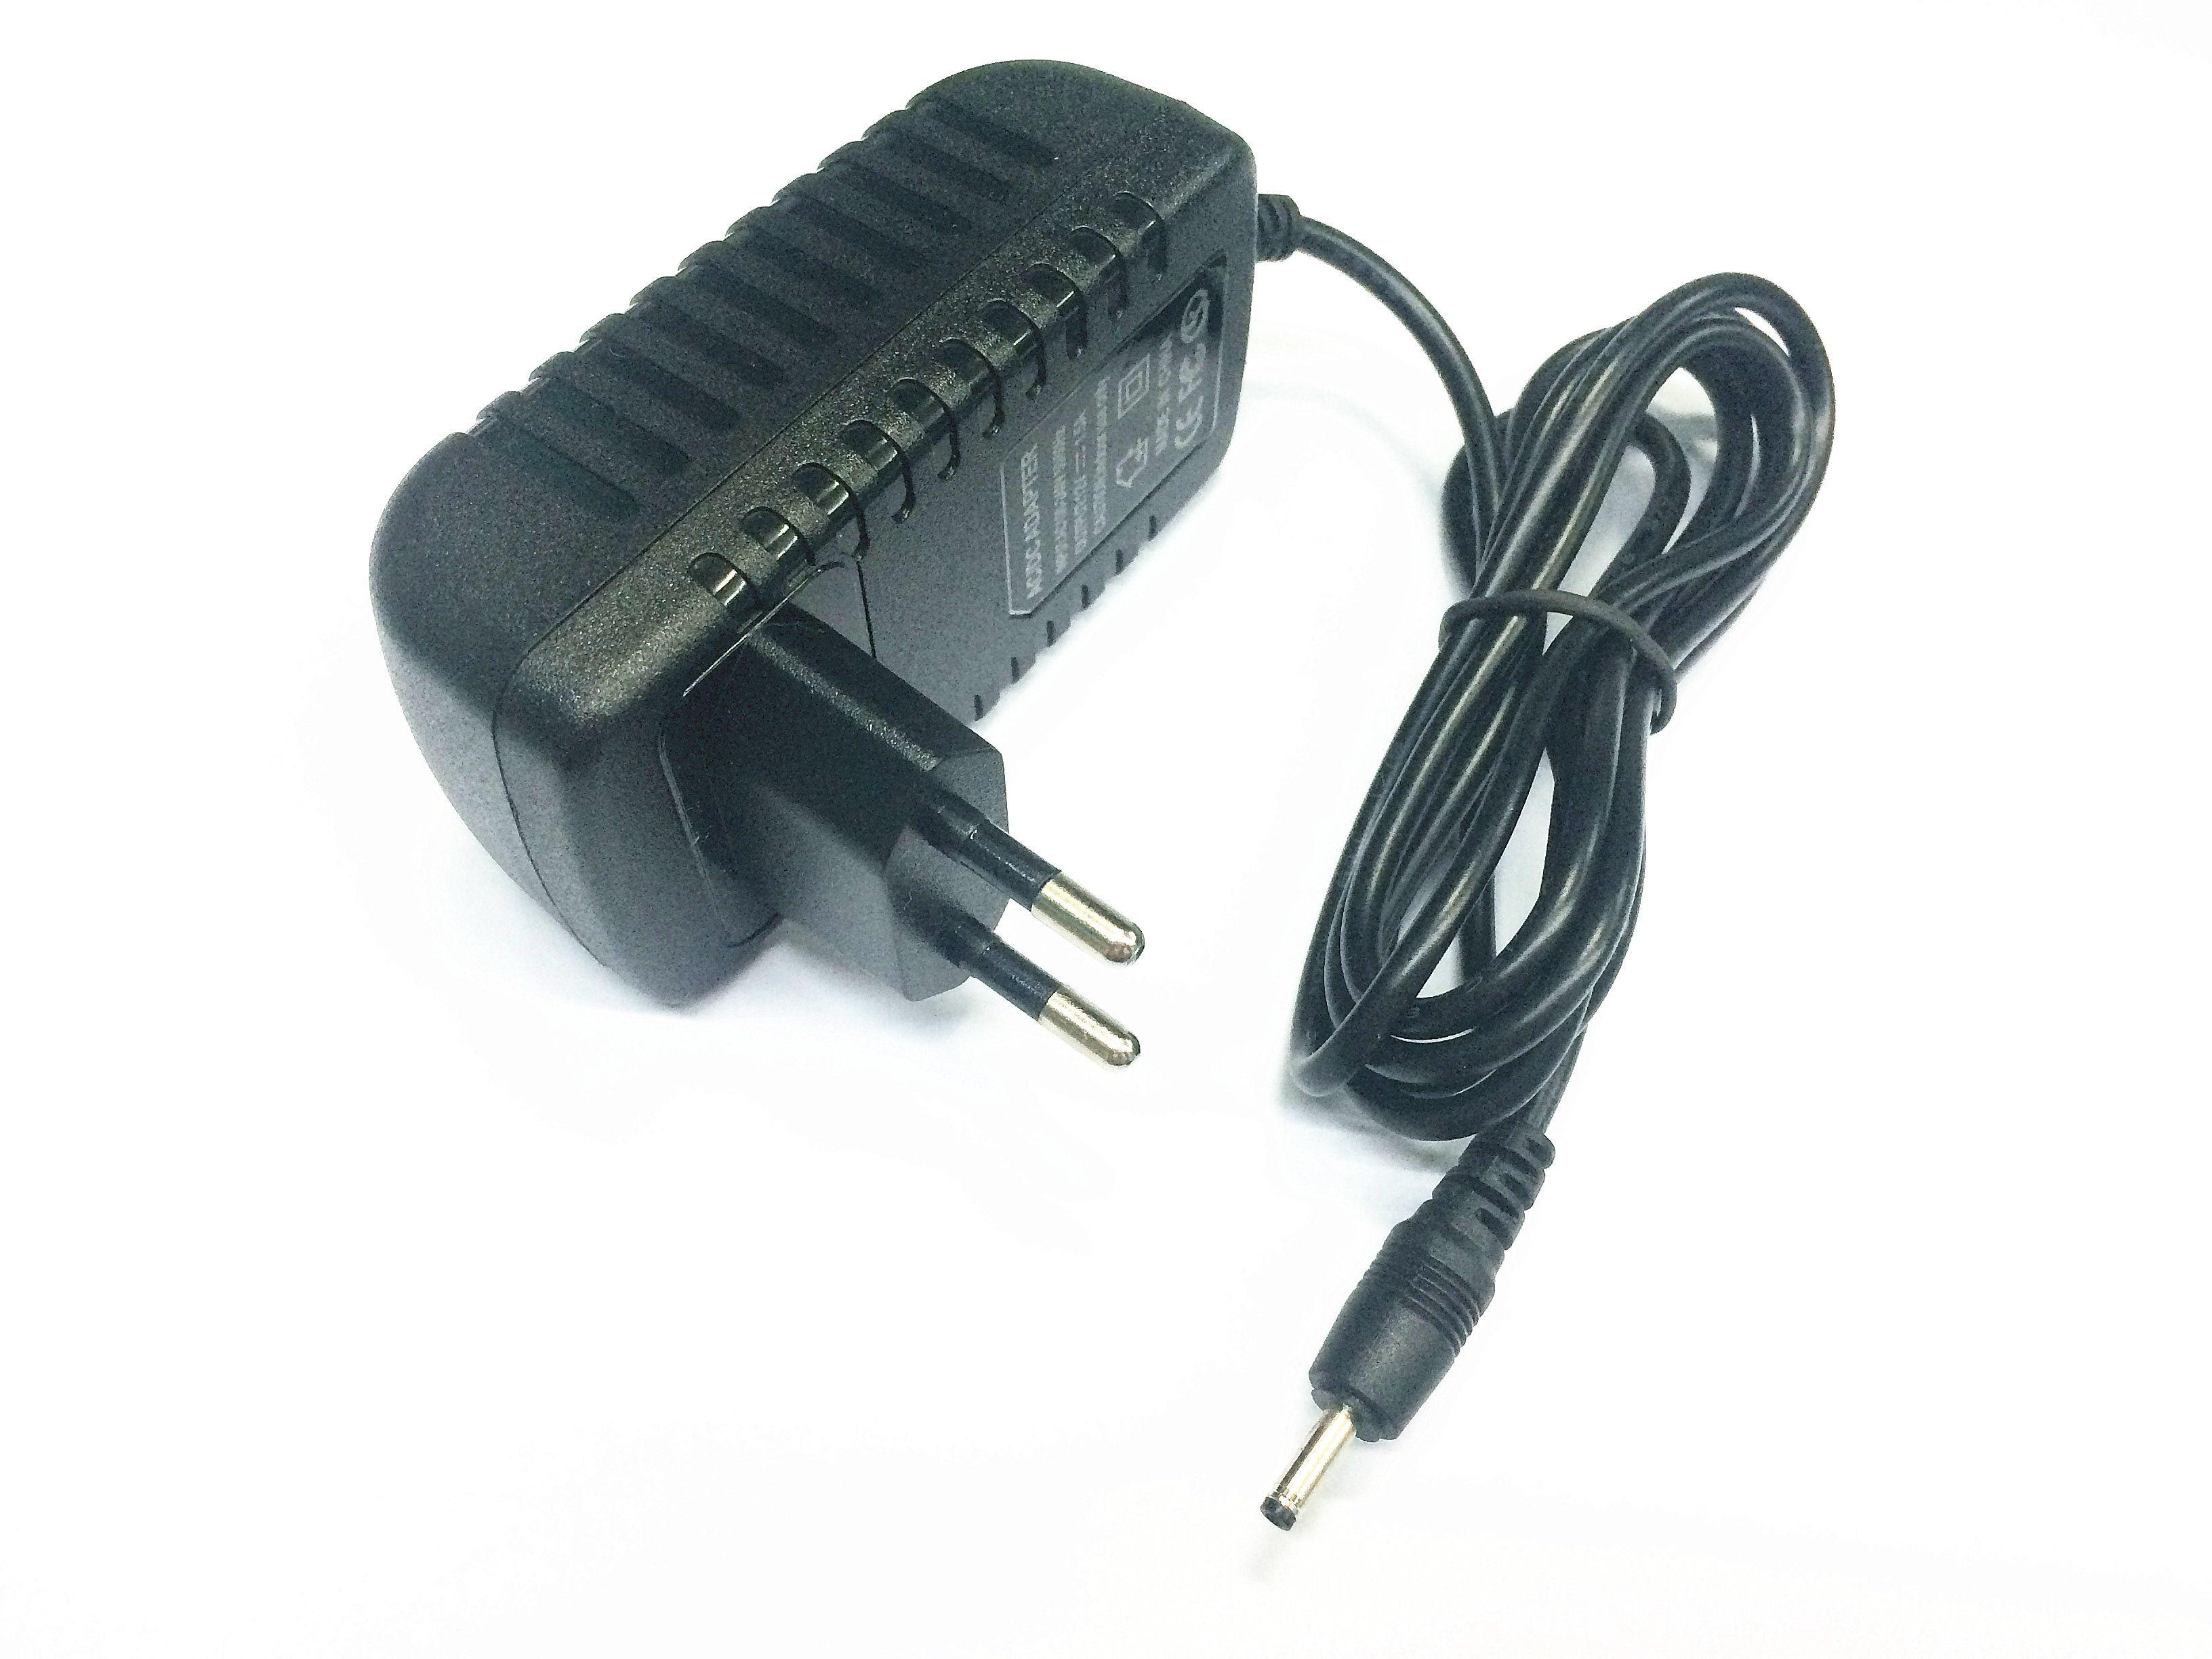 EU plug 12V 1.5A For Acer Iconia Tab A500 A501 A100 A200 Tablet PC Power Adapter 18W AC adapter